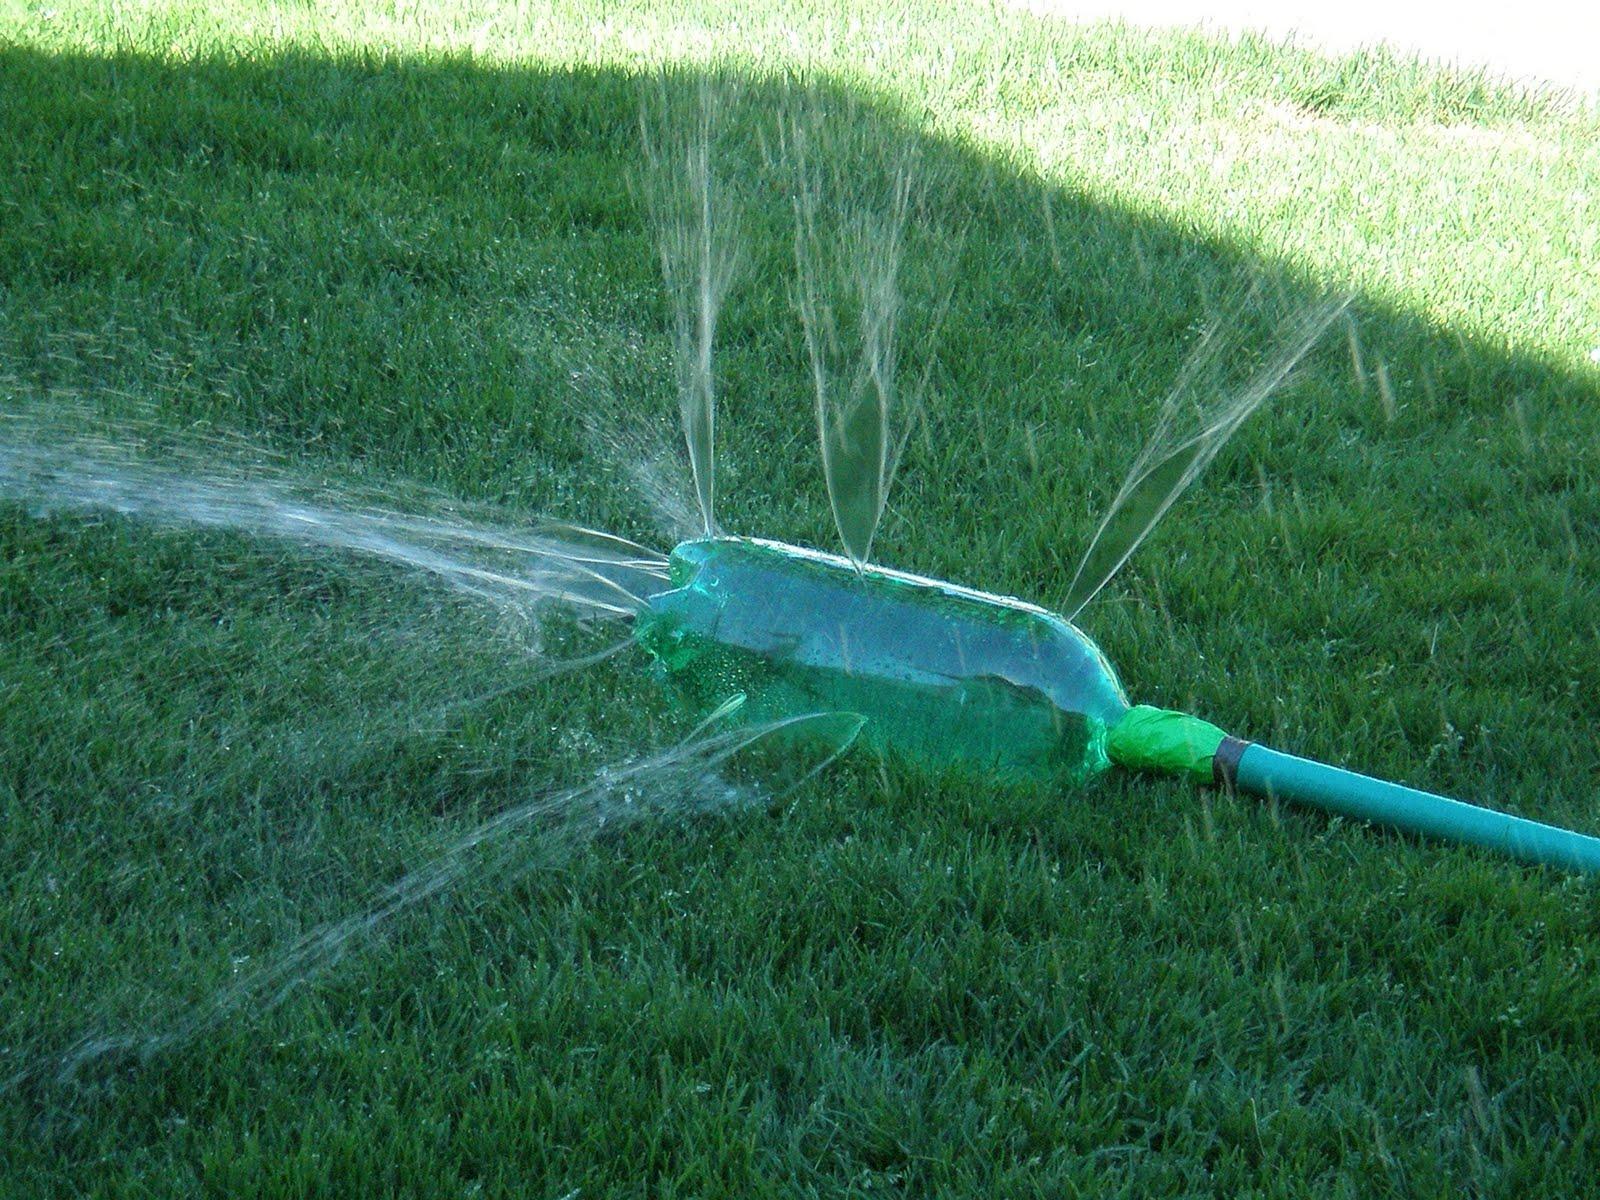 diy sprinklers u2014 all for the boys